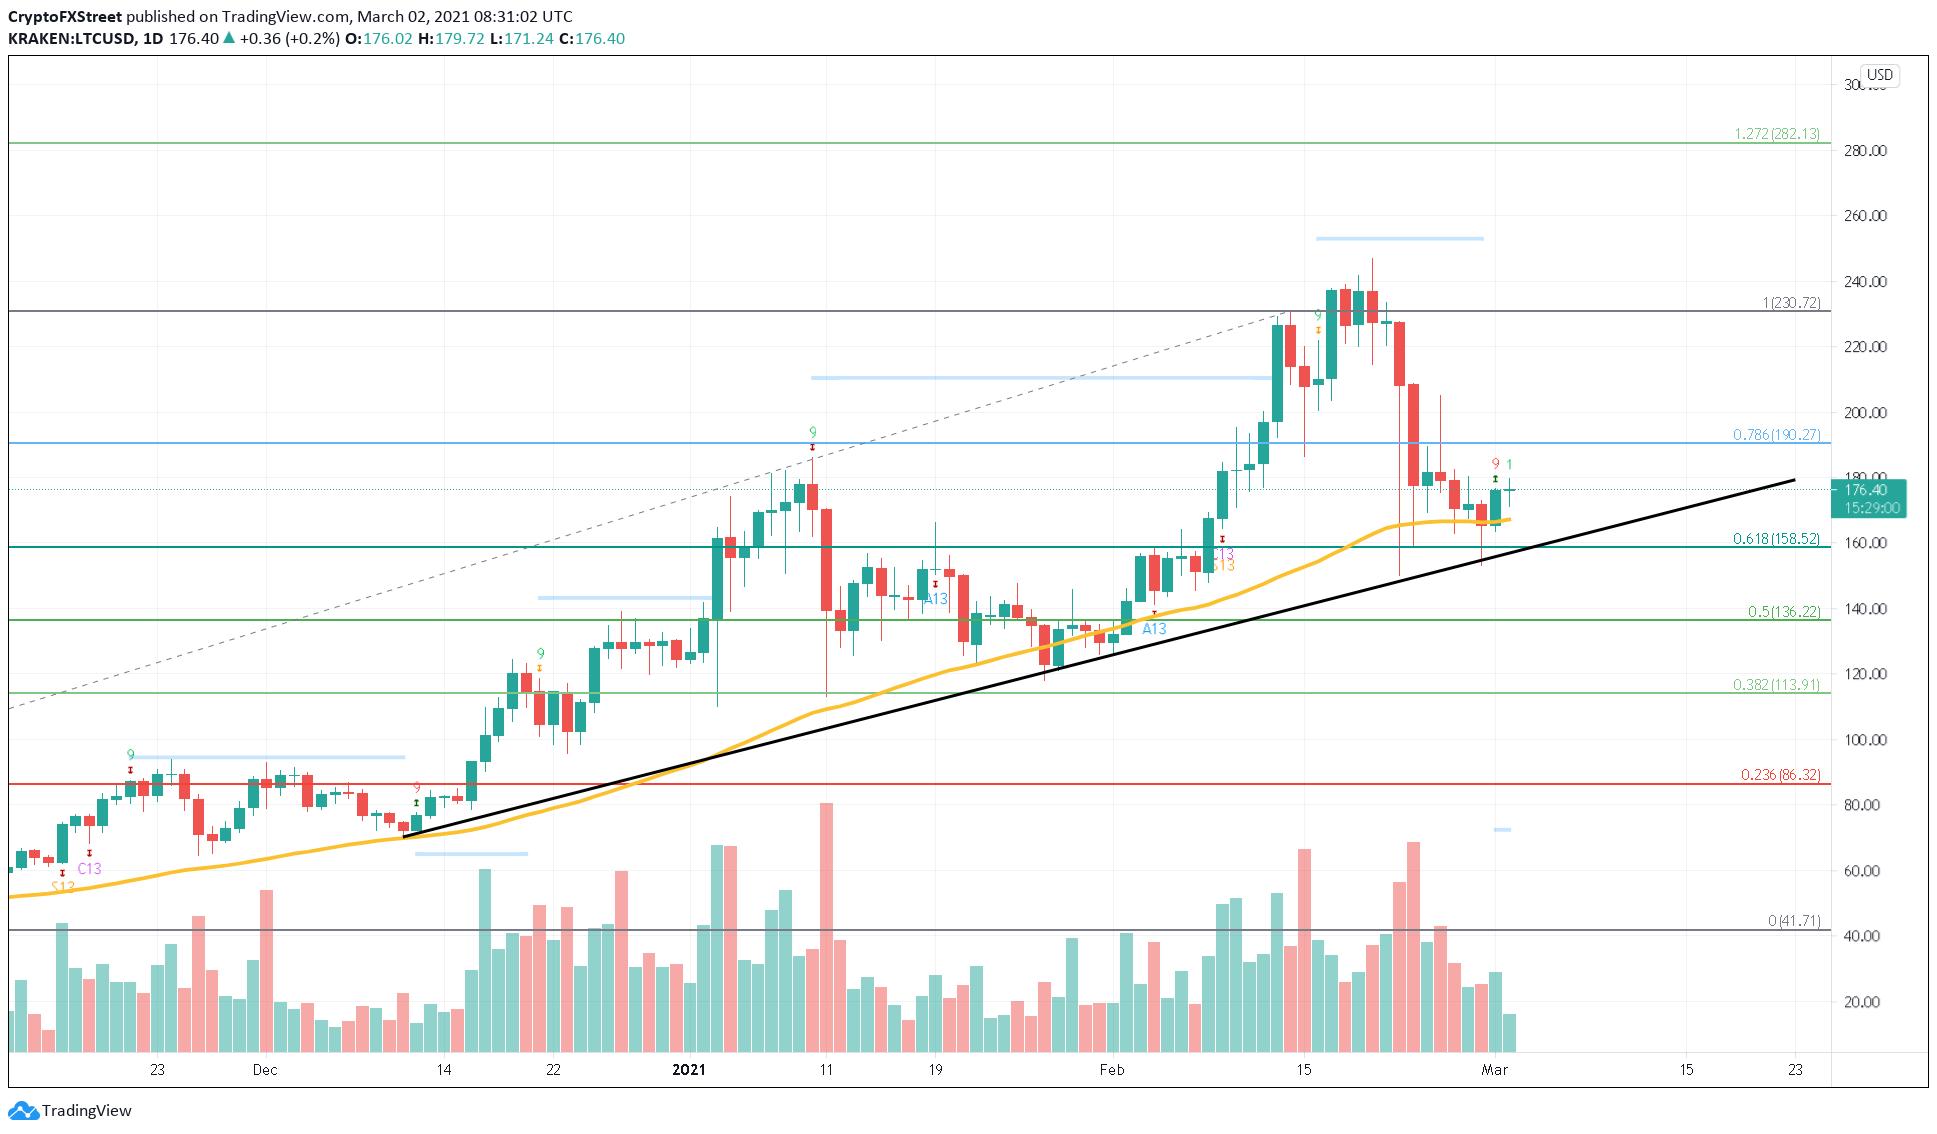 LTC/USD 1-day chart